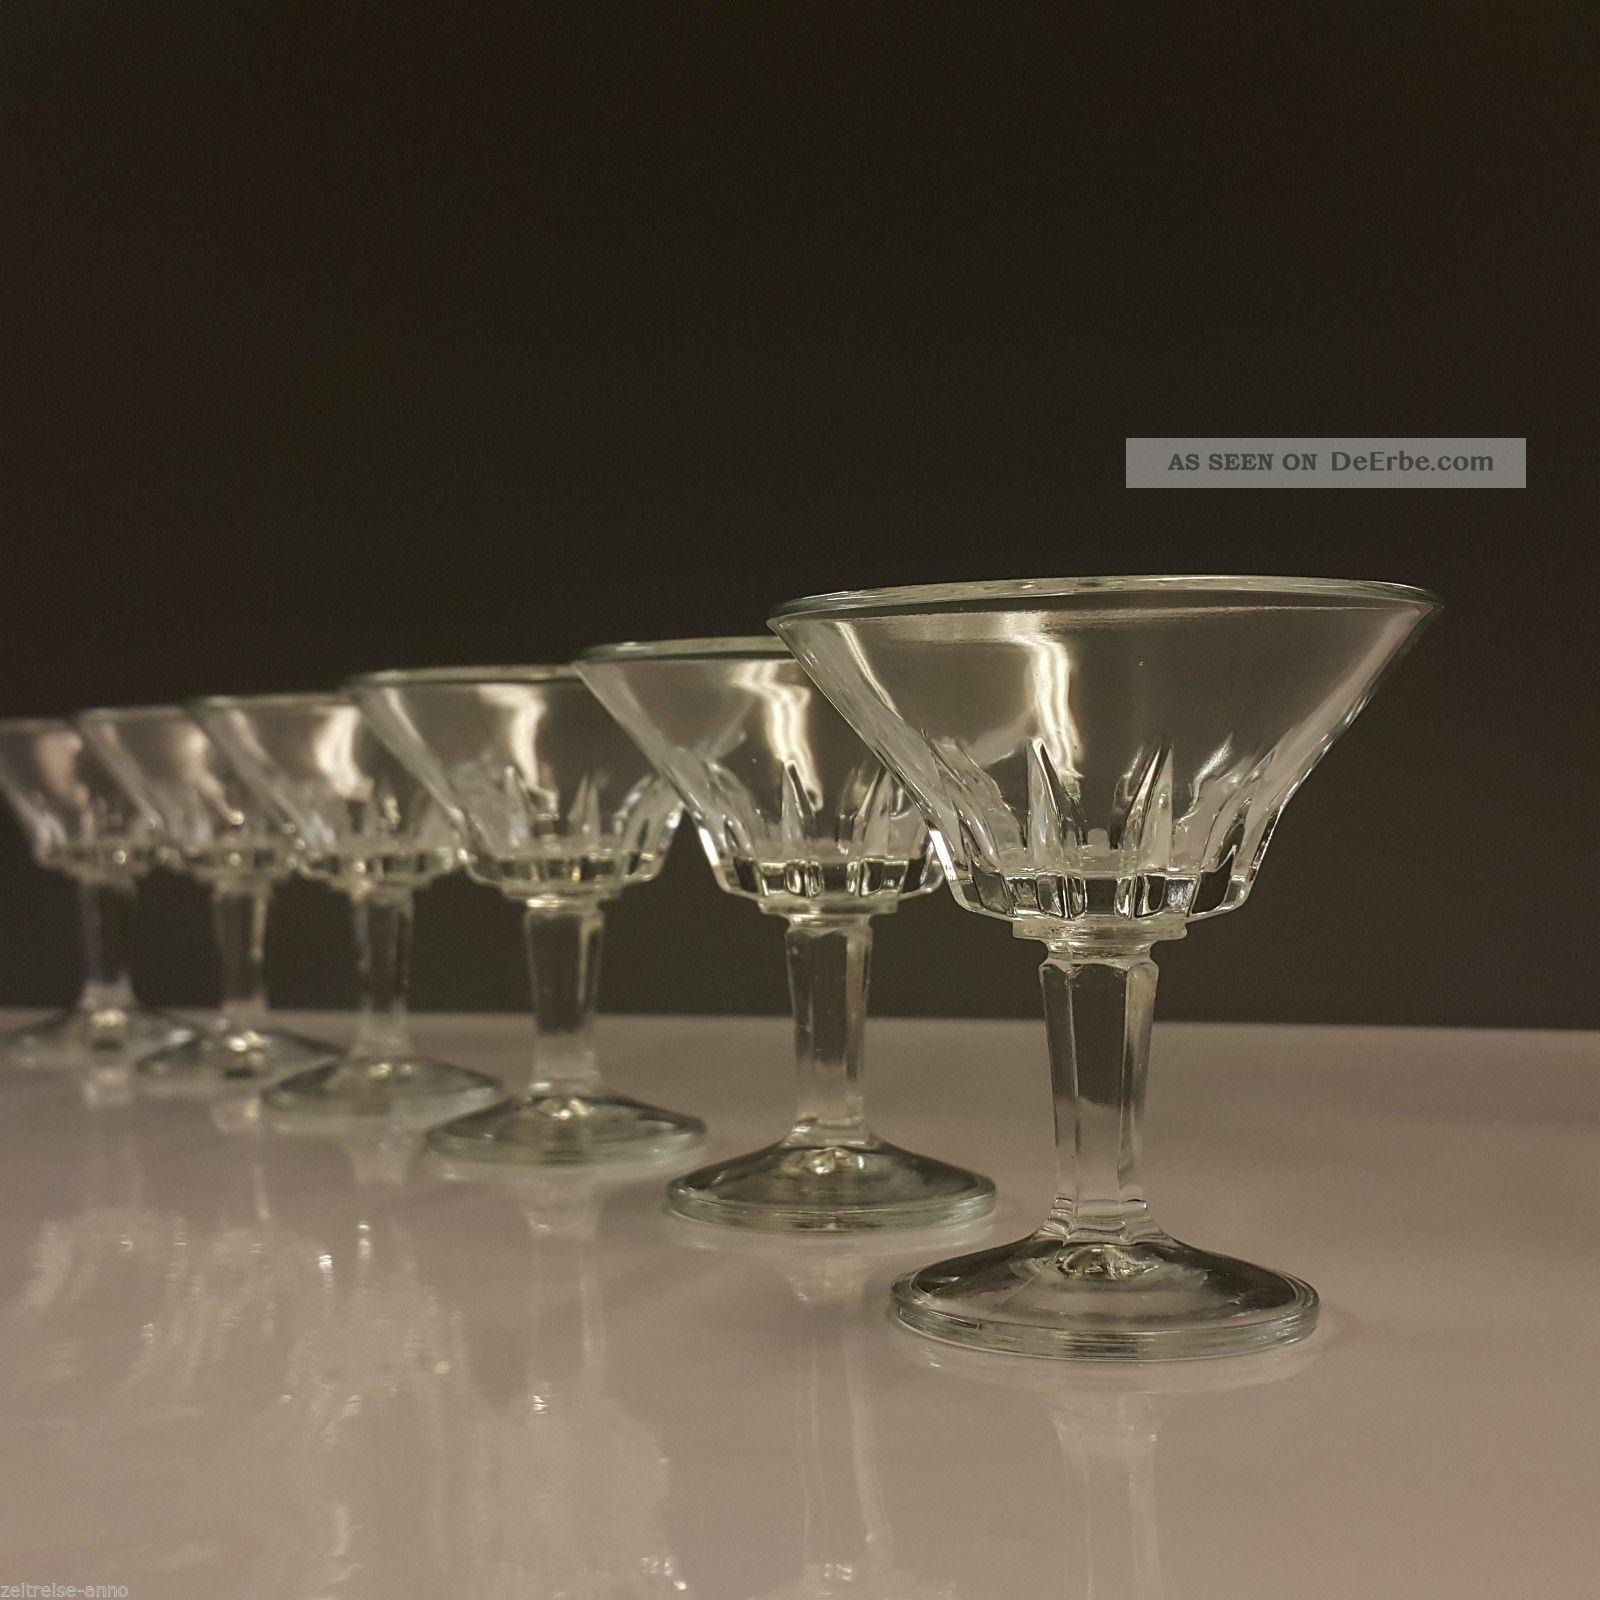 6 Cristal D`arques Likörgläser Kelchglas Regency Einreihiger Kerbschliff 7,  6cm H Kristall Bild